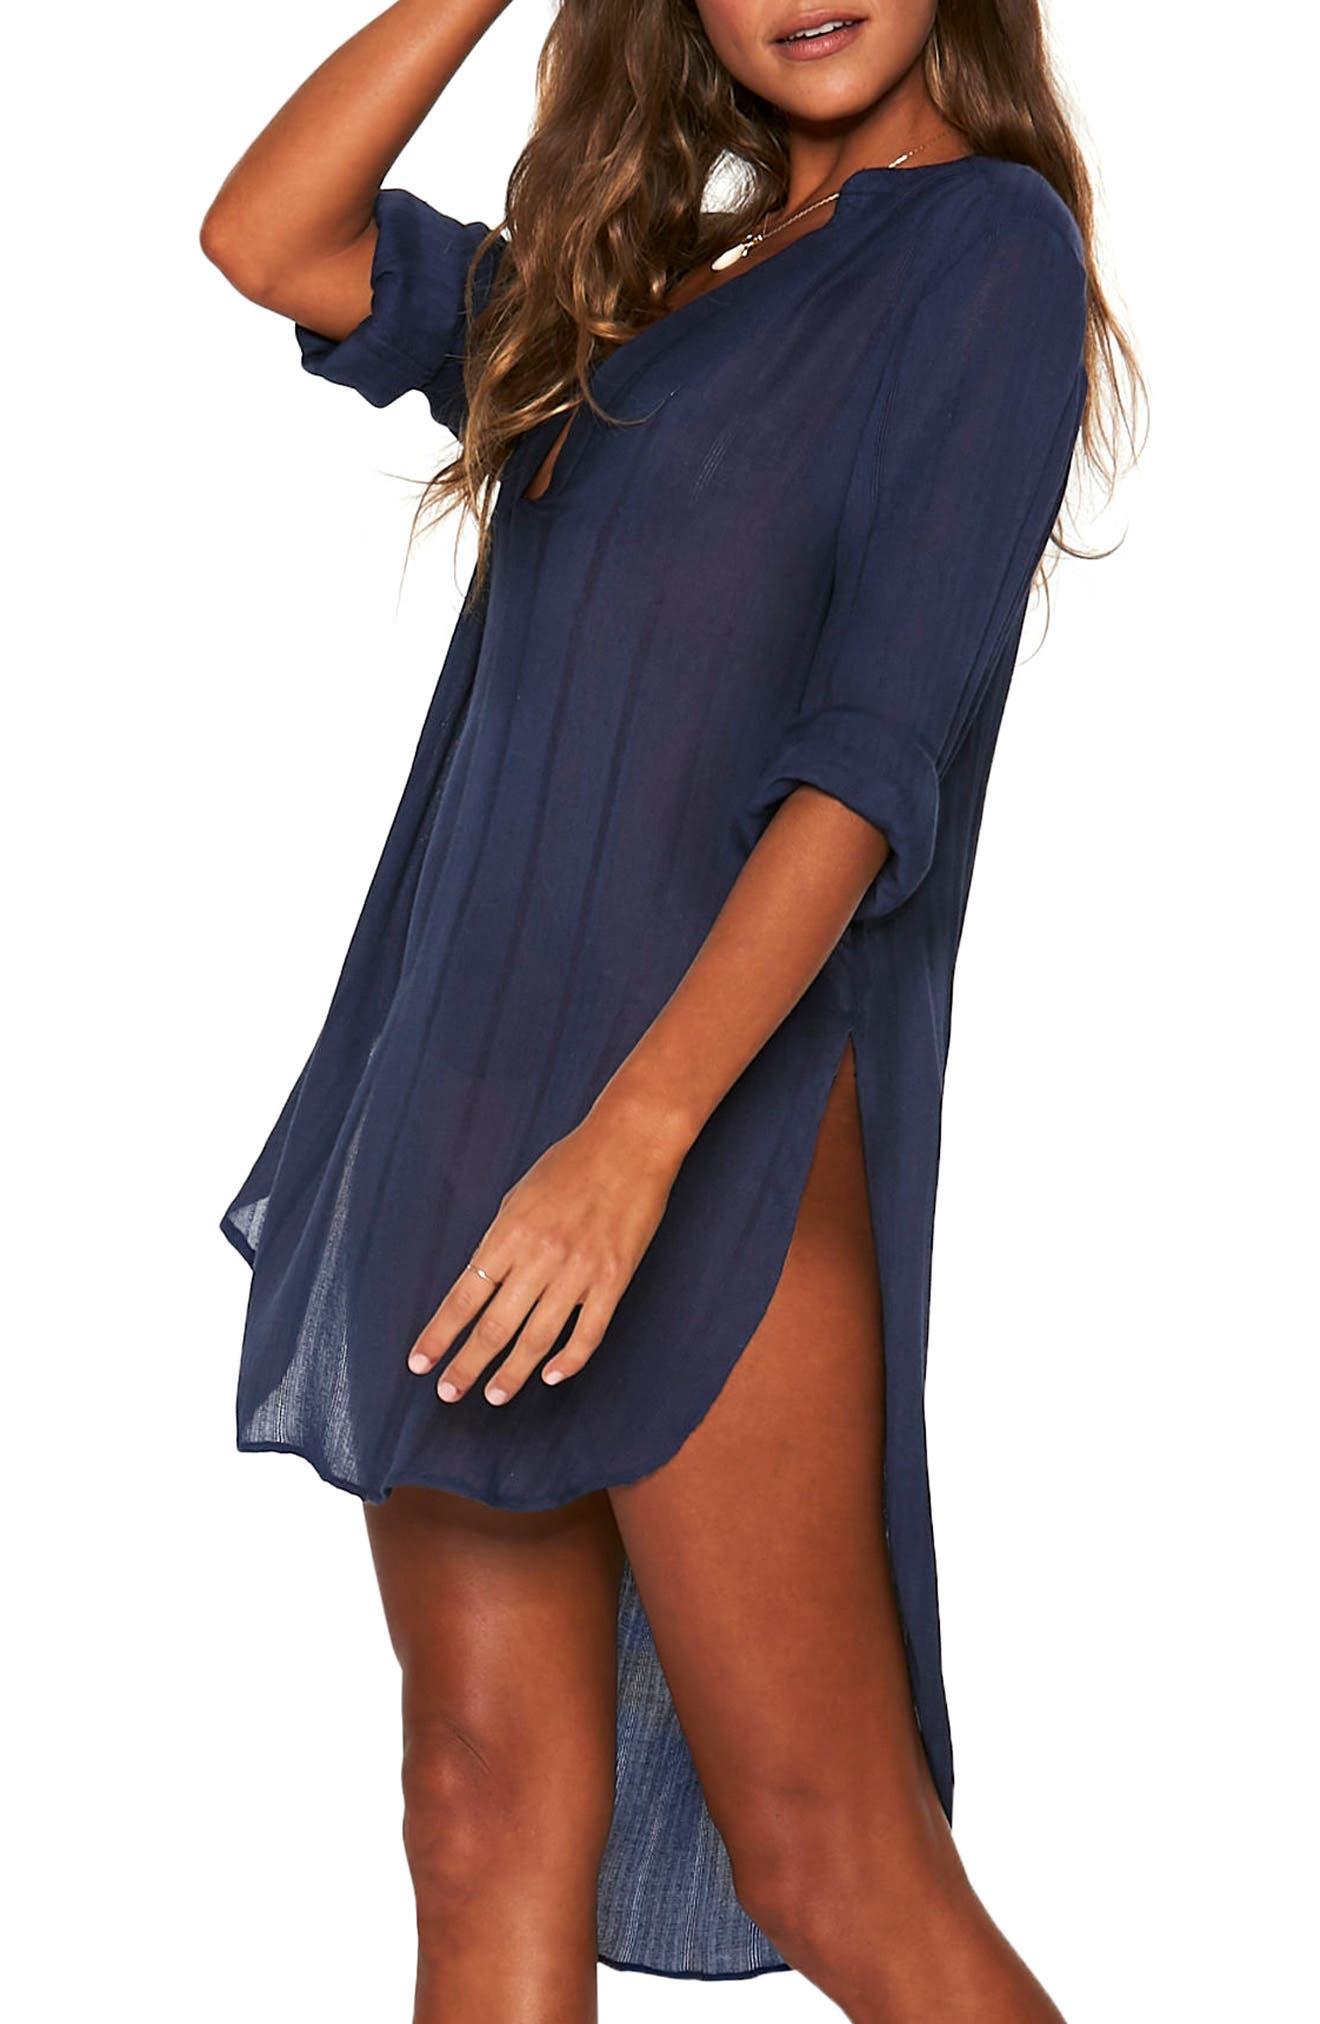 Megan Cover-Up Tunic,                             Main thumbnail 1, color,                             MIDNIGHT BLUE